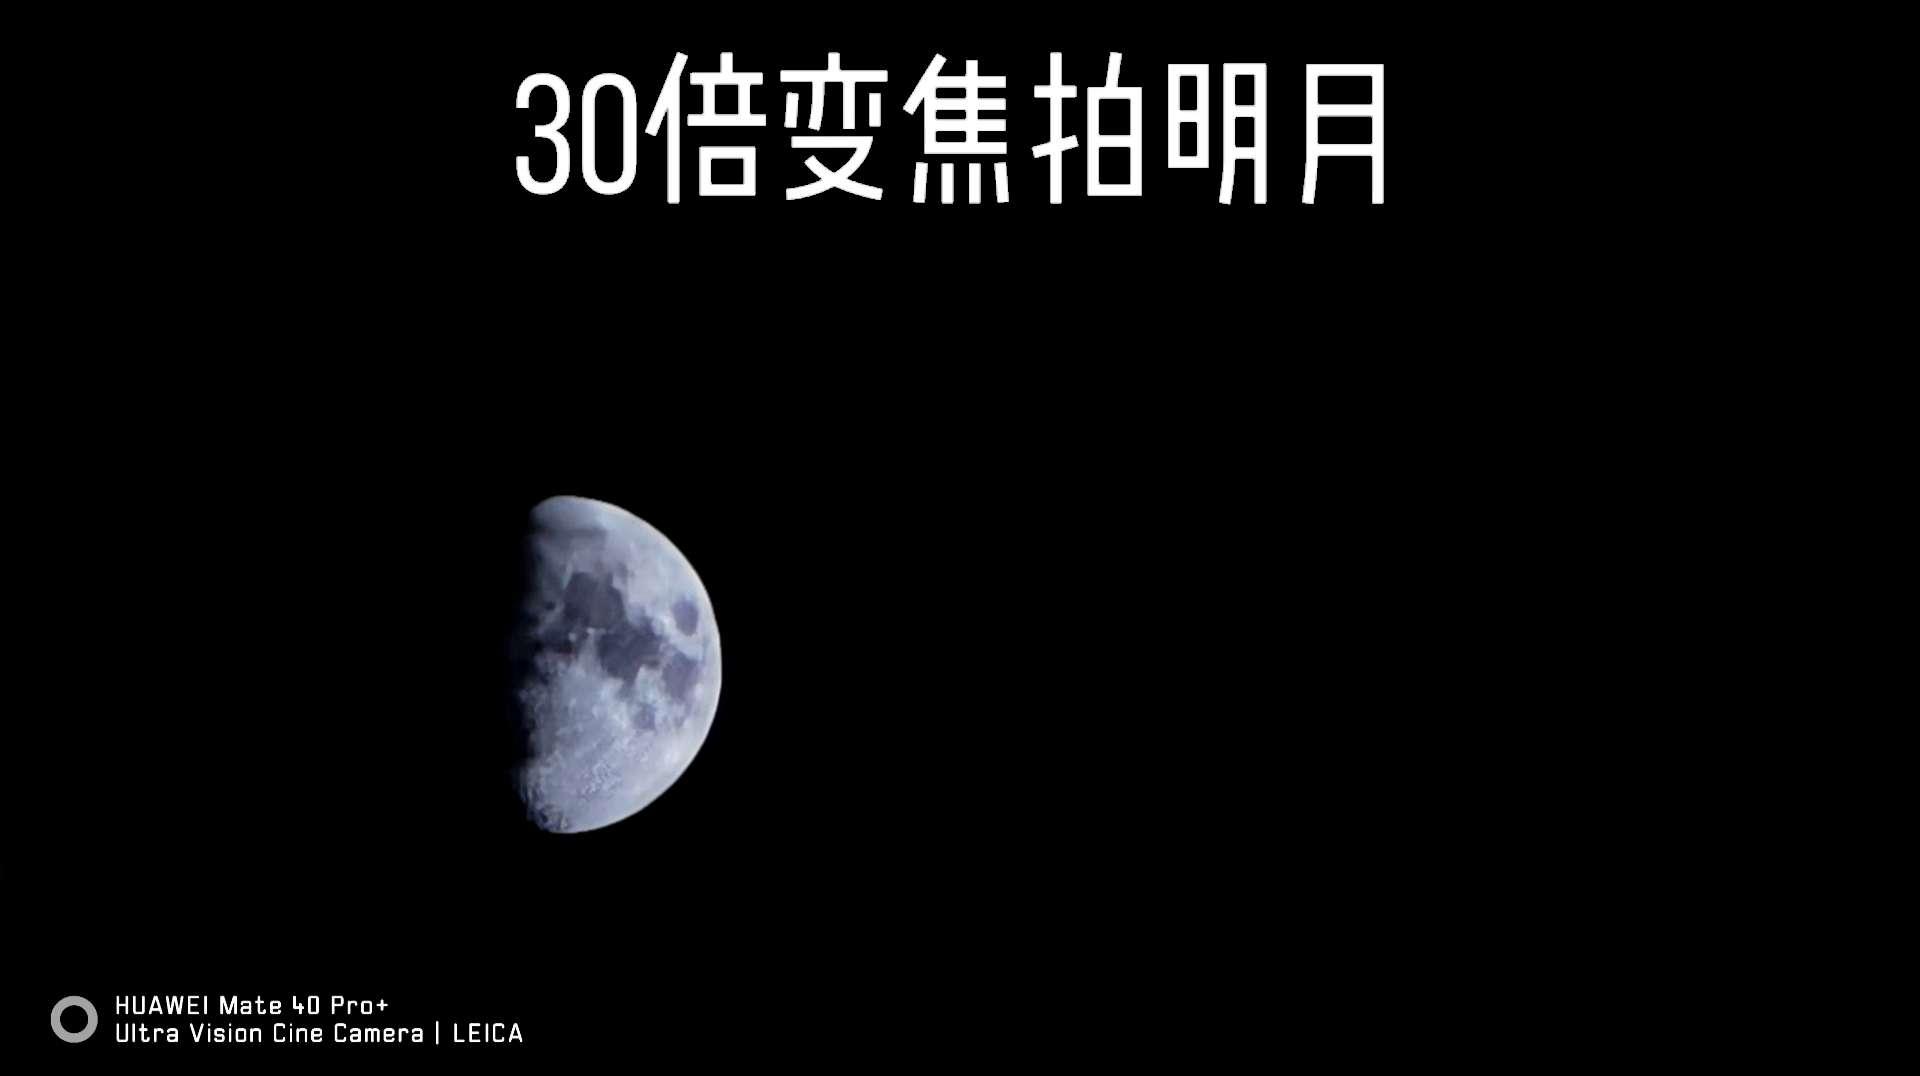 【MATE 40 PRO+】30倍变焦4K拍明月,随手拍-花粉俱乐部